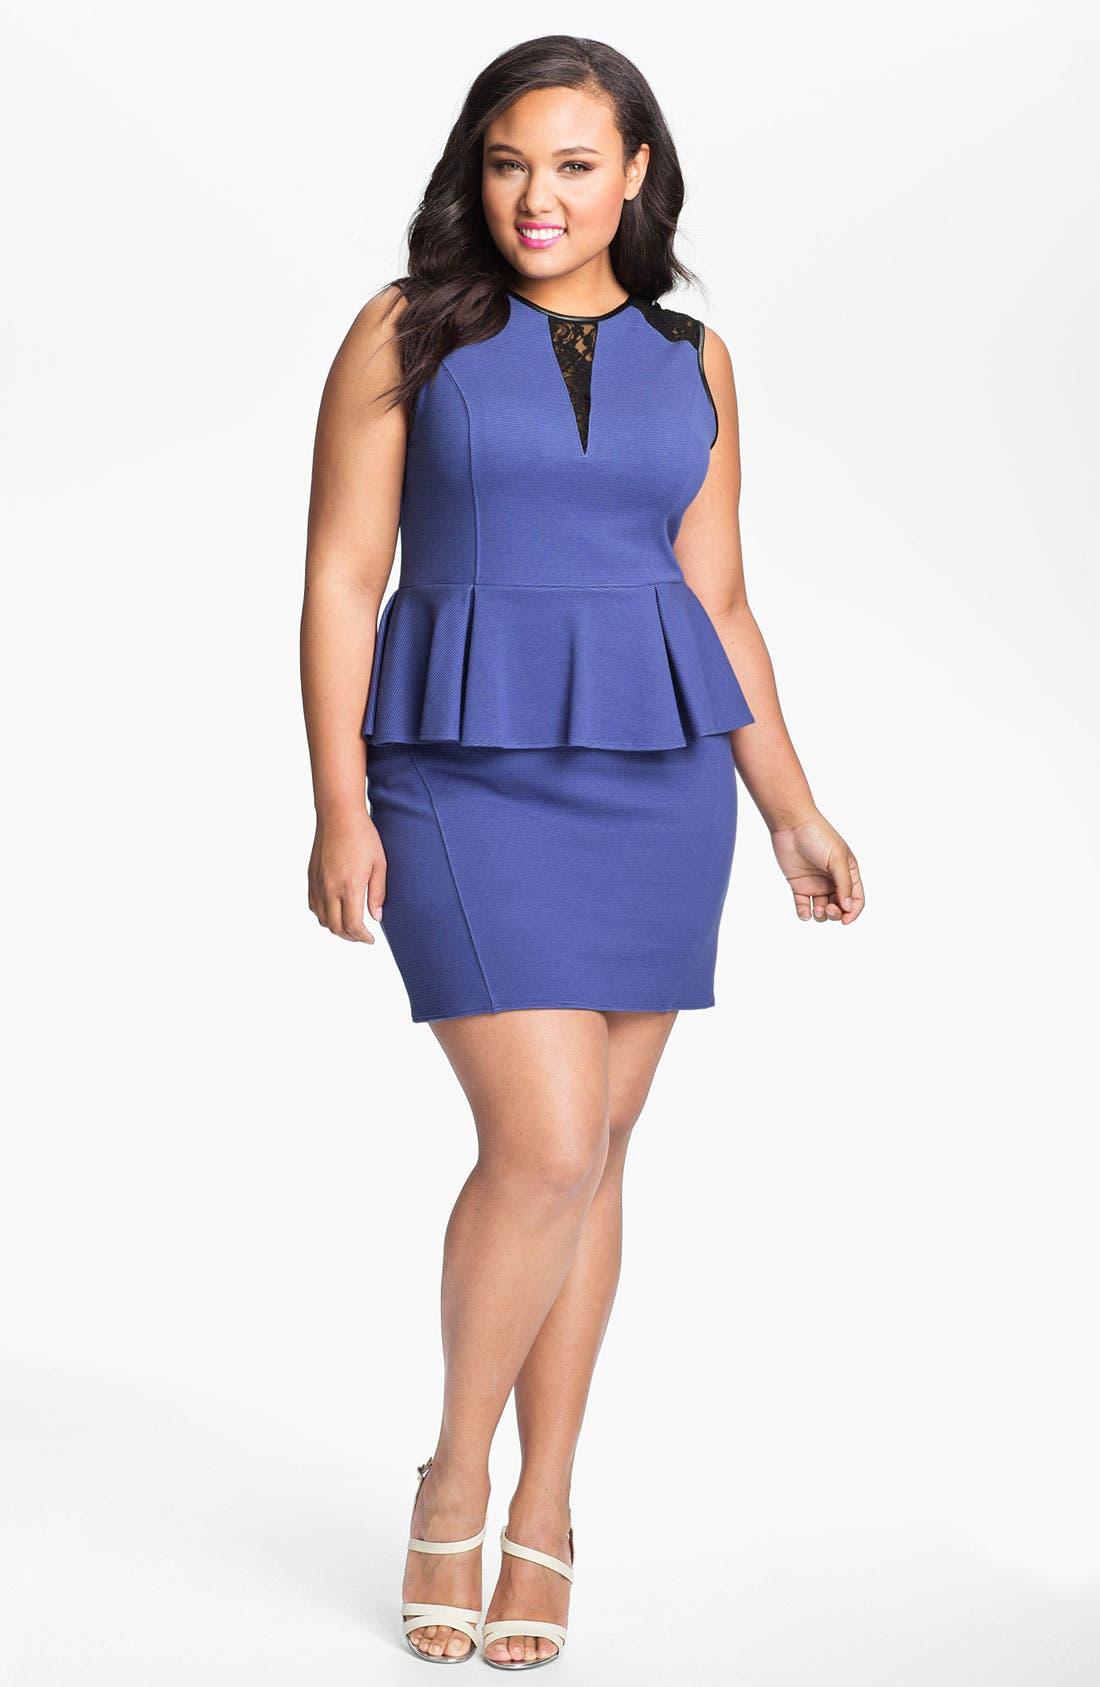 Main Image - ABS by Allen Schwartz Lace Inset Peplum Sheath Dress (Plus Size)